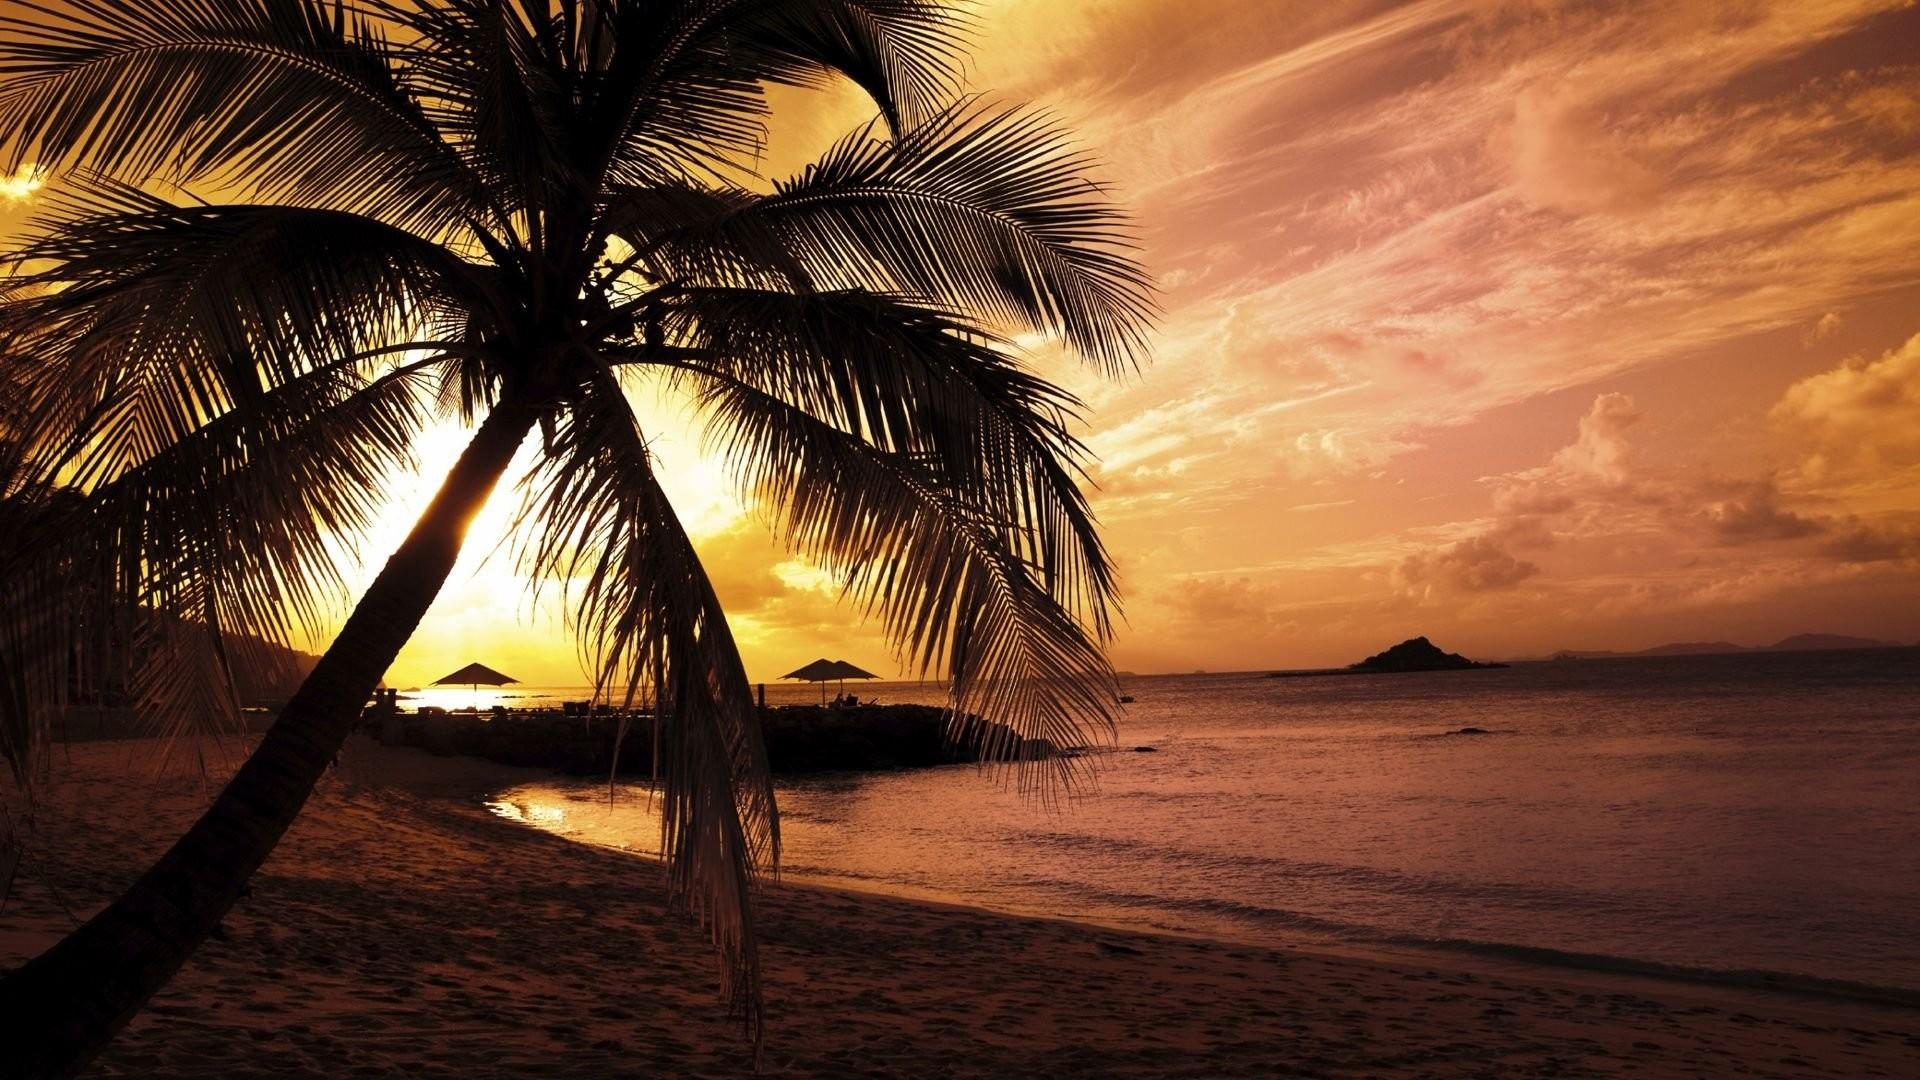 Night Beach Wallpaper HD